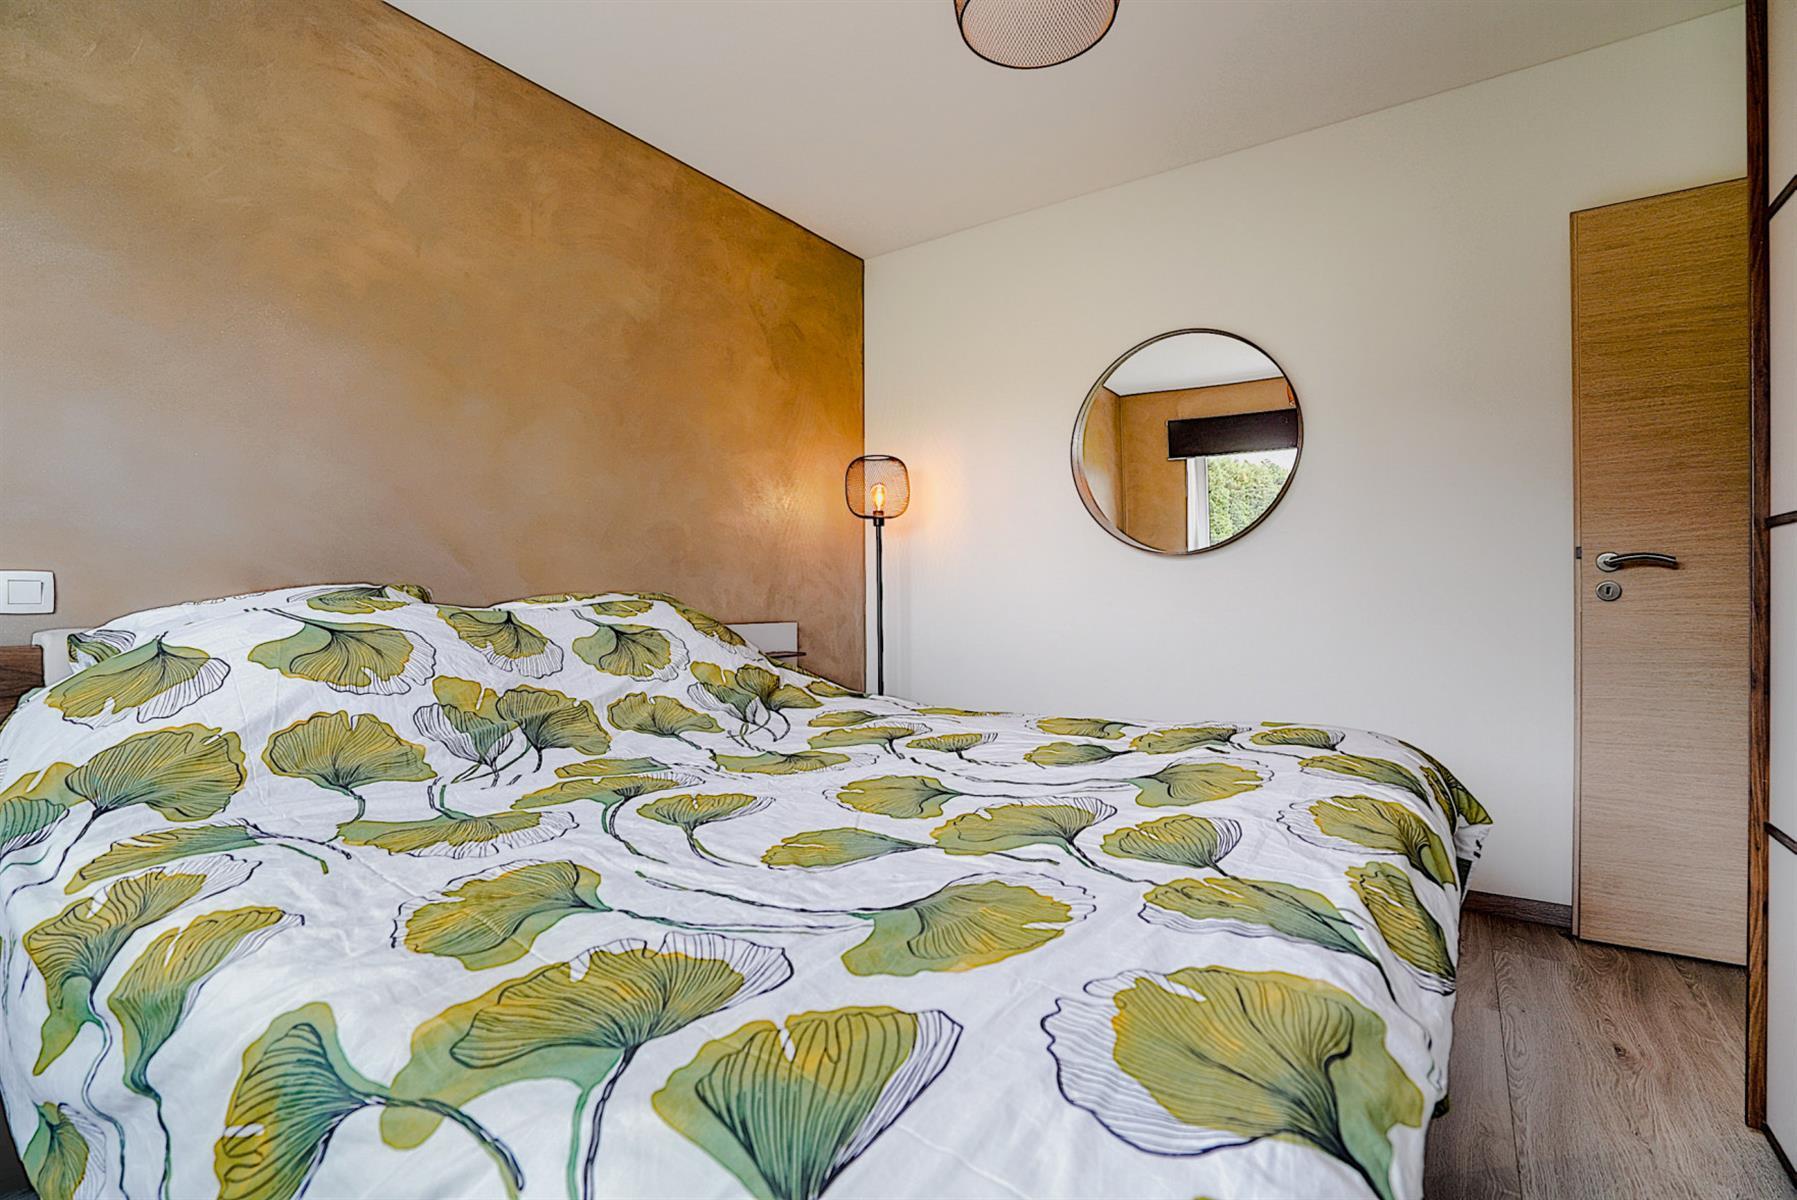 Appartement - Grâce-hollogne - #4364483-20